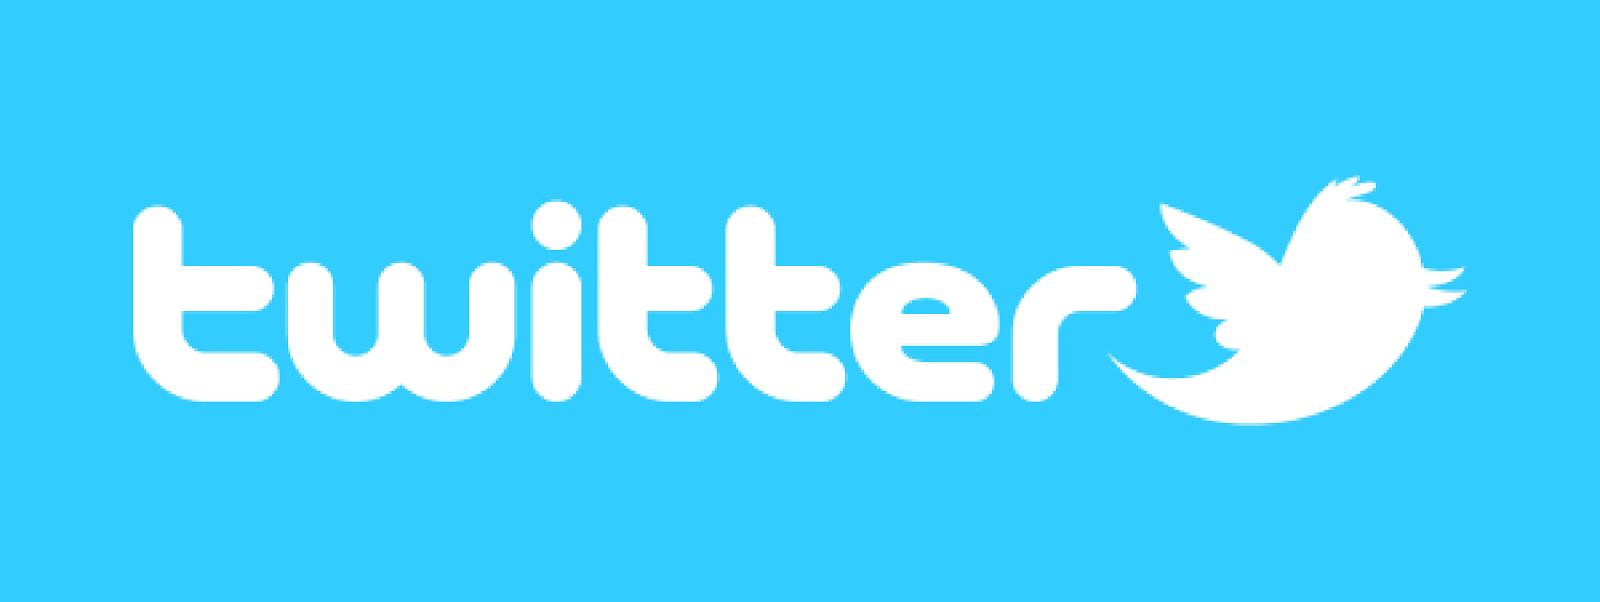 Panduan Cara Membuat Twitter Dengan Mudah Terbaru 2016